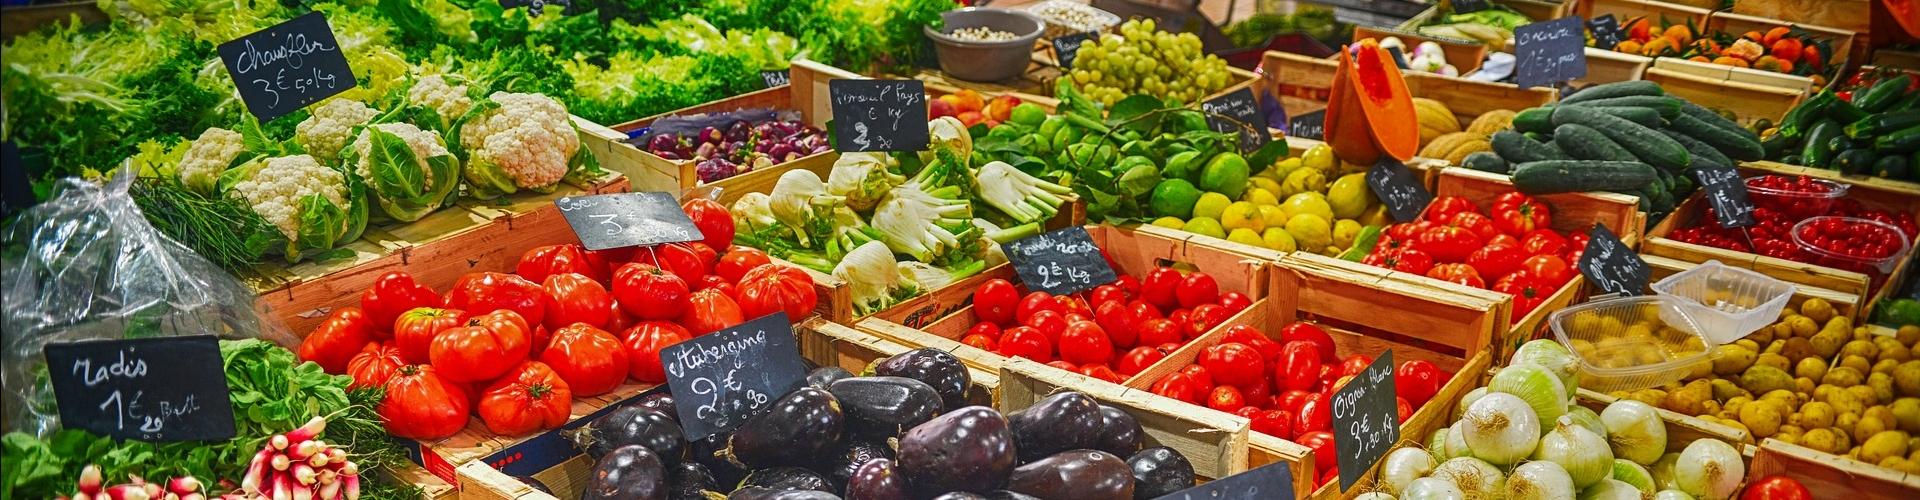 vitamine-mineralen-tekort-testen-vegatest